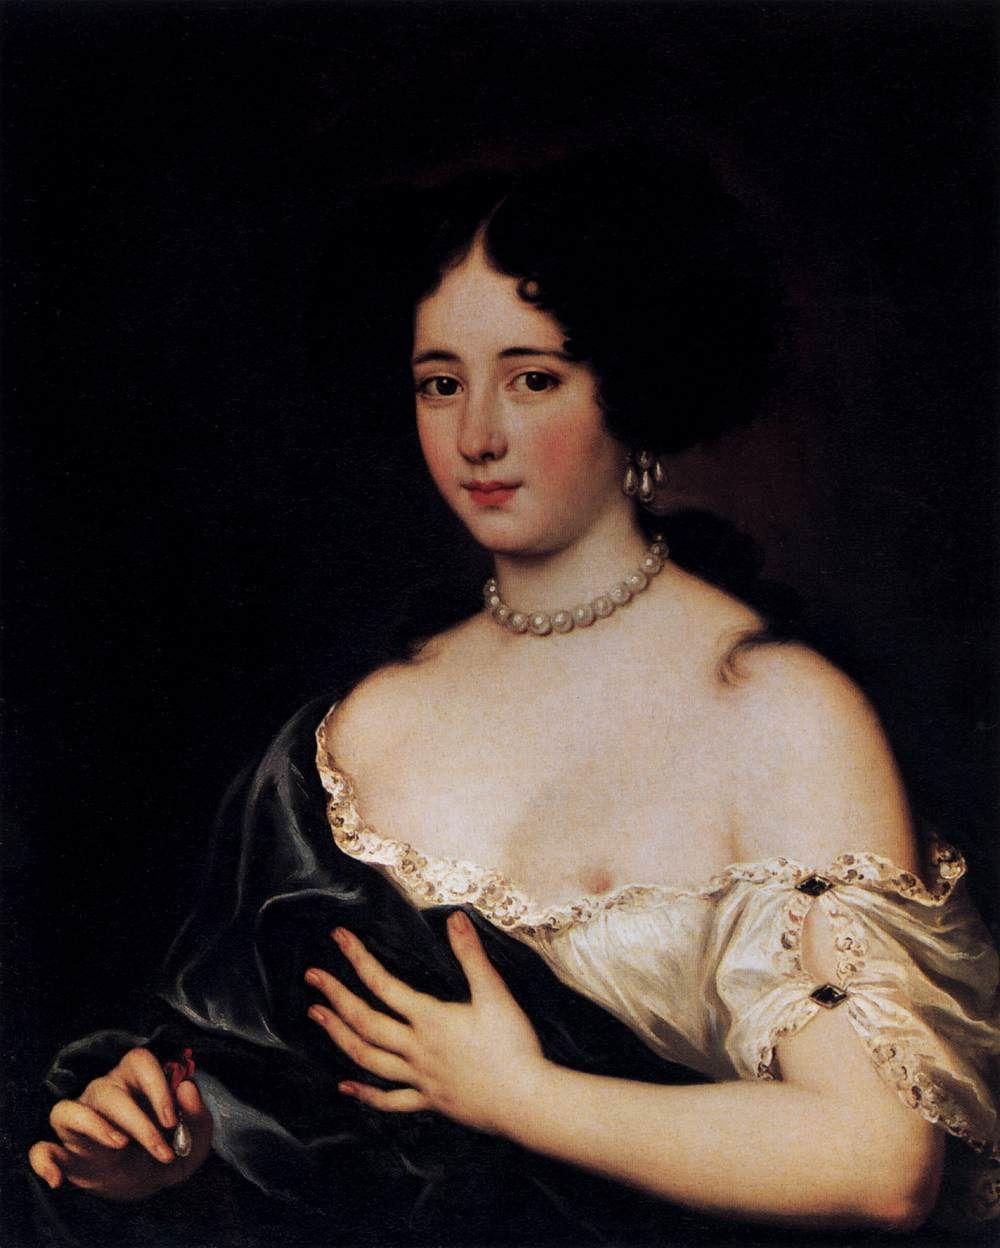 VOET, Jacob Ferdinand (b. 1639, Antwerpen, d. ca. 1700, Paris) Maria Mancini as Cleopatra 1663-72 Oil on canvas, 75 x 62 cm Staatliche Museen, Berlin